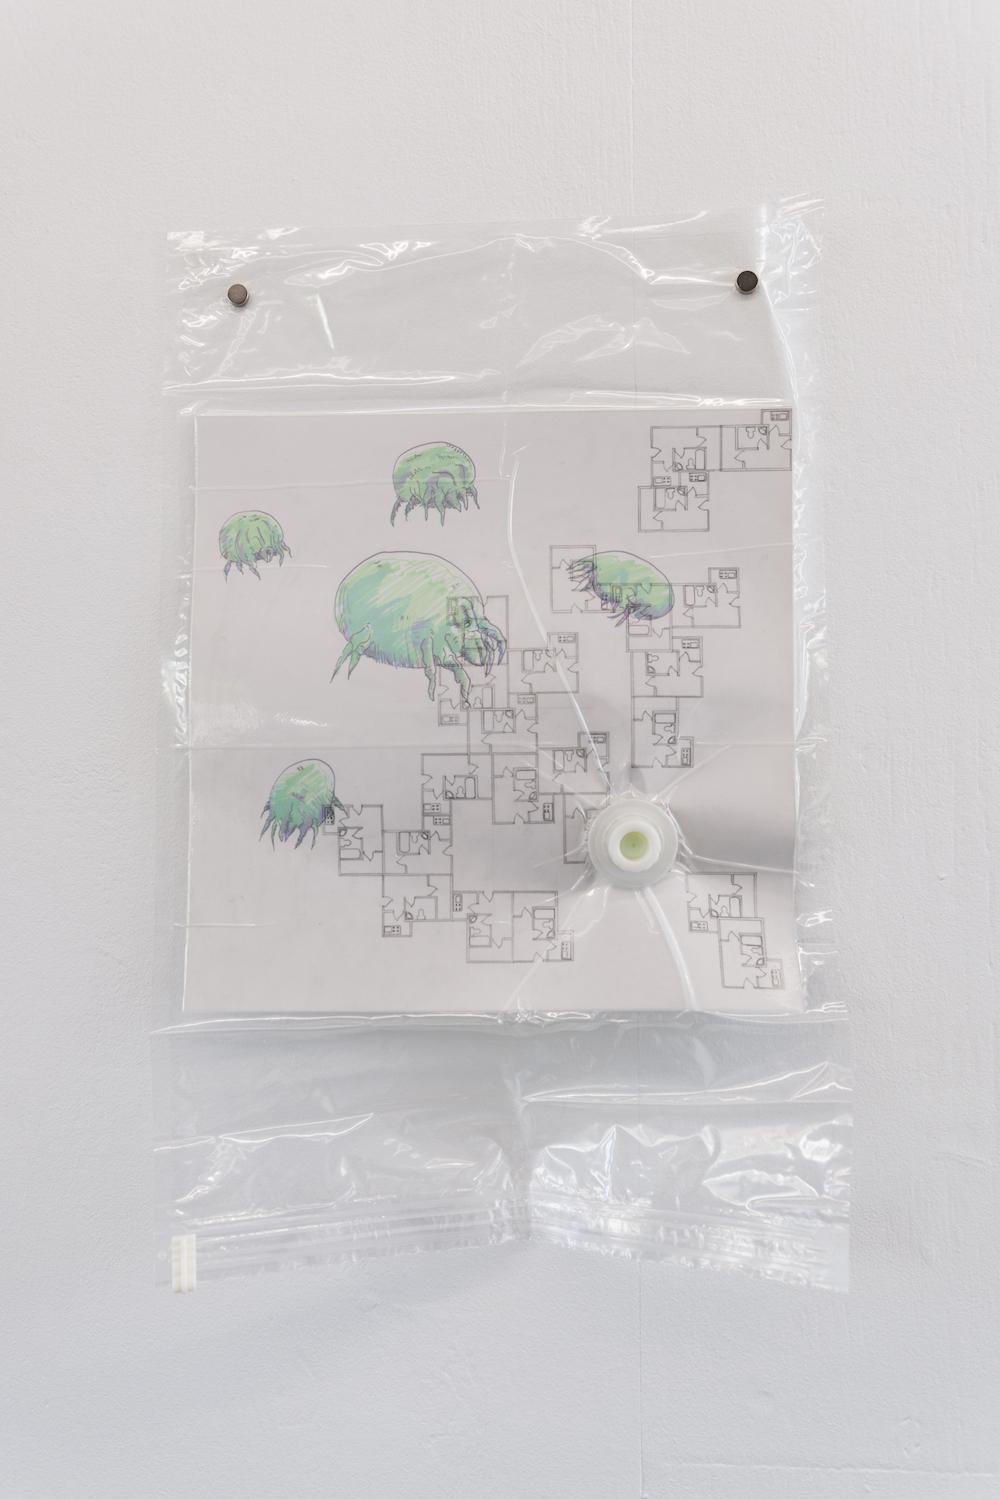 Nadim Abbas, Poor Toy (Dust Mite), 2019. Vacuum bag, vellum, paper, pencil, marker. 70 x 45 cm. Photographer Nici Jost.